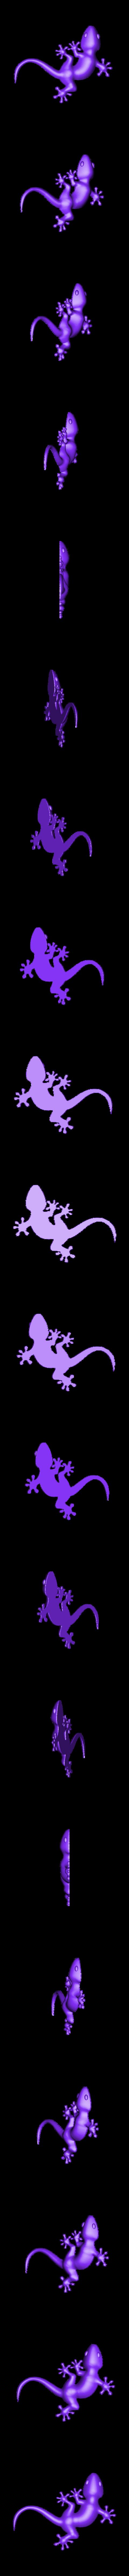 lezard3.stl Download free STL file gecko • 3D printer model, robinwood87cnc